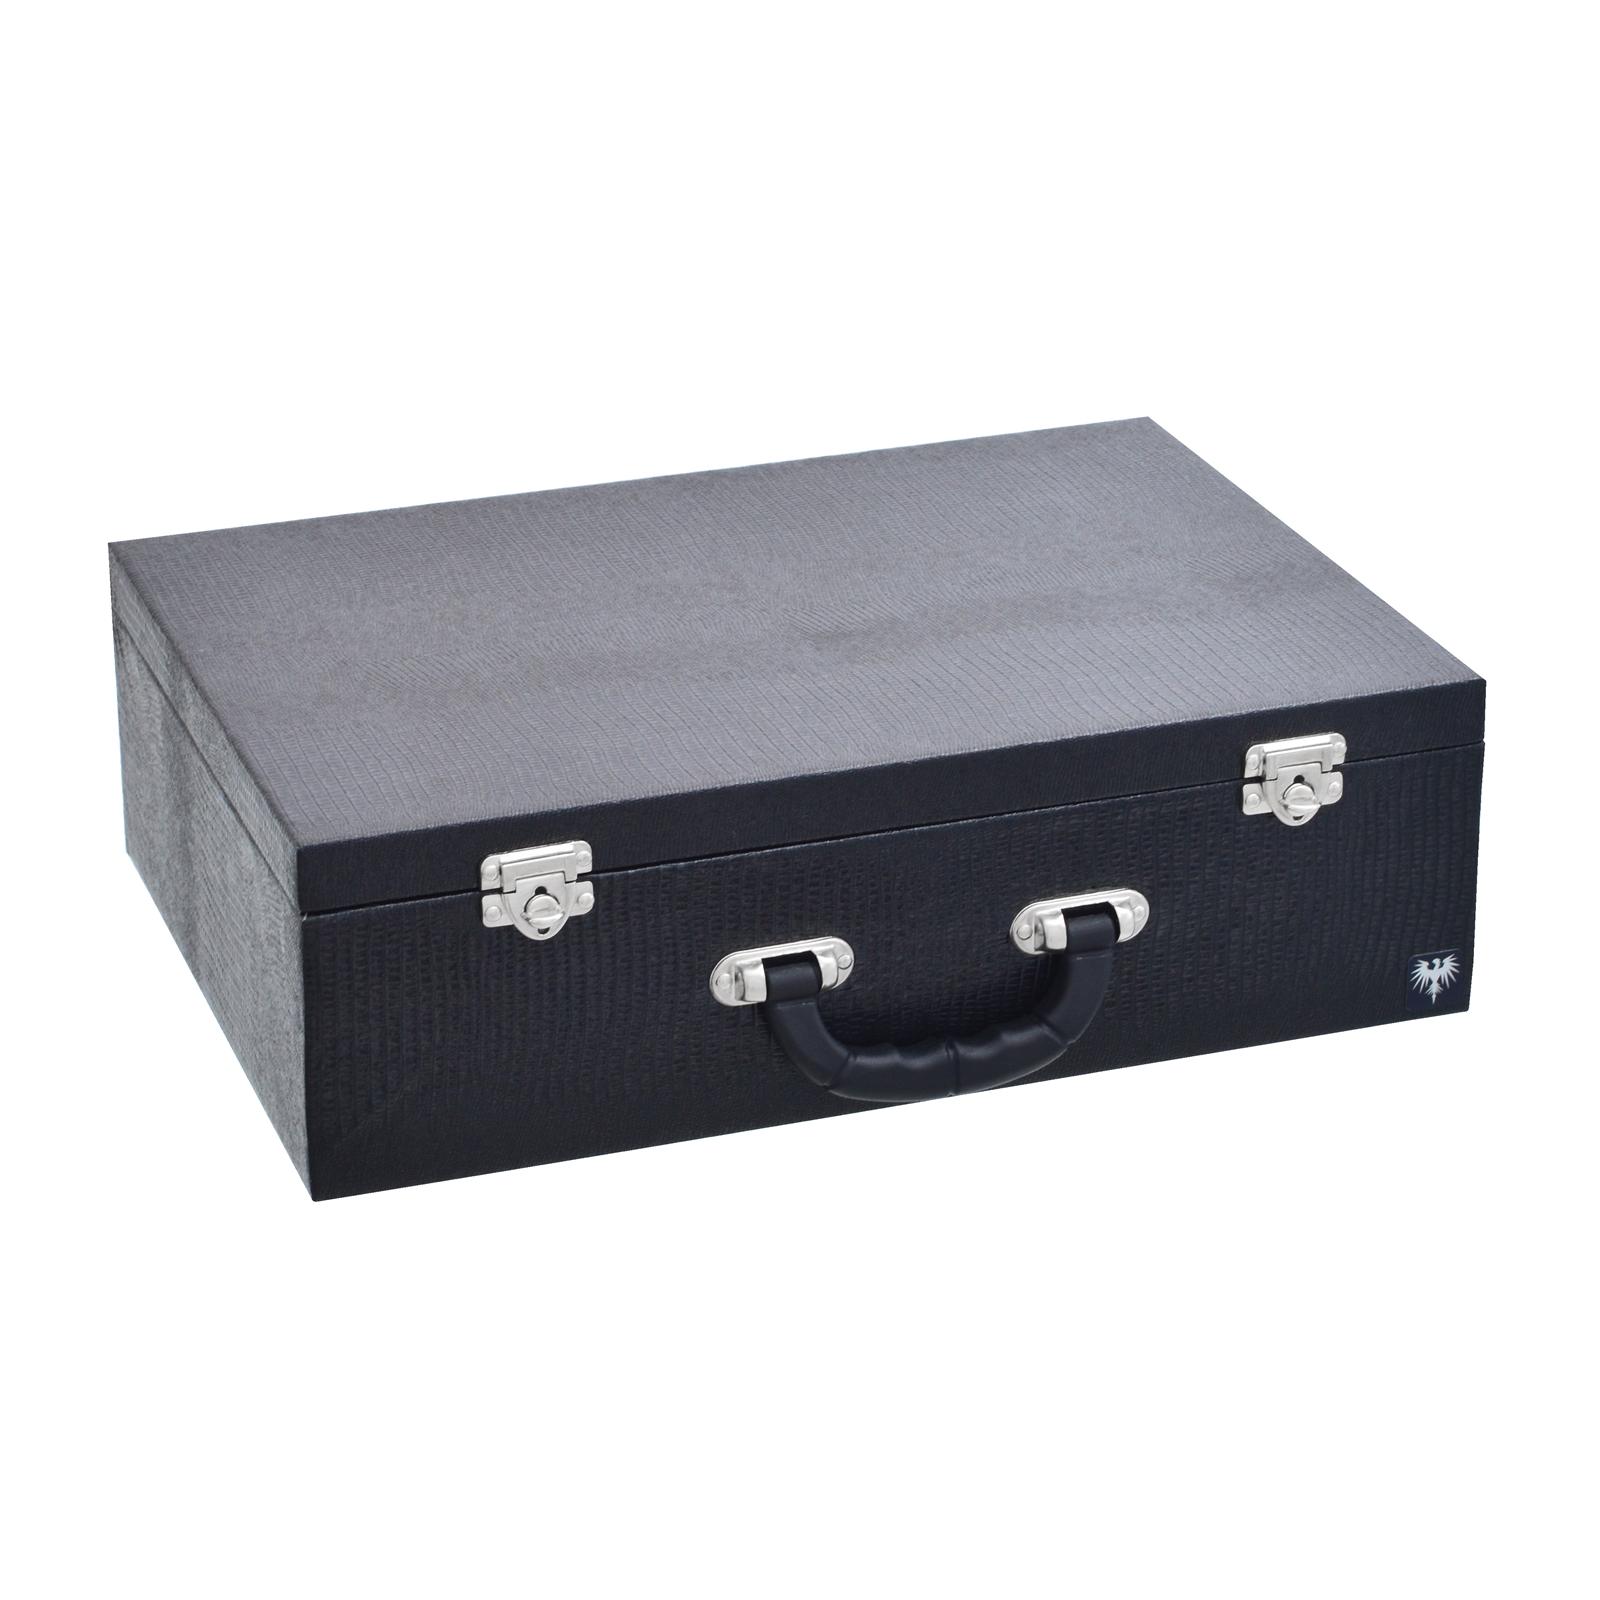 maleta-porta-relogio-30-nichos-couro-ecologico-preto-preto-imagem-2.JPG